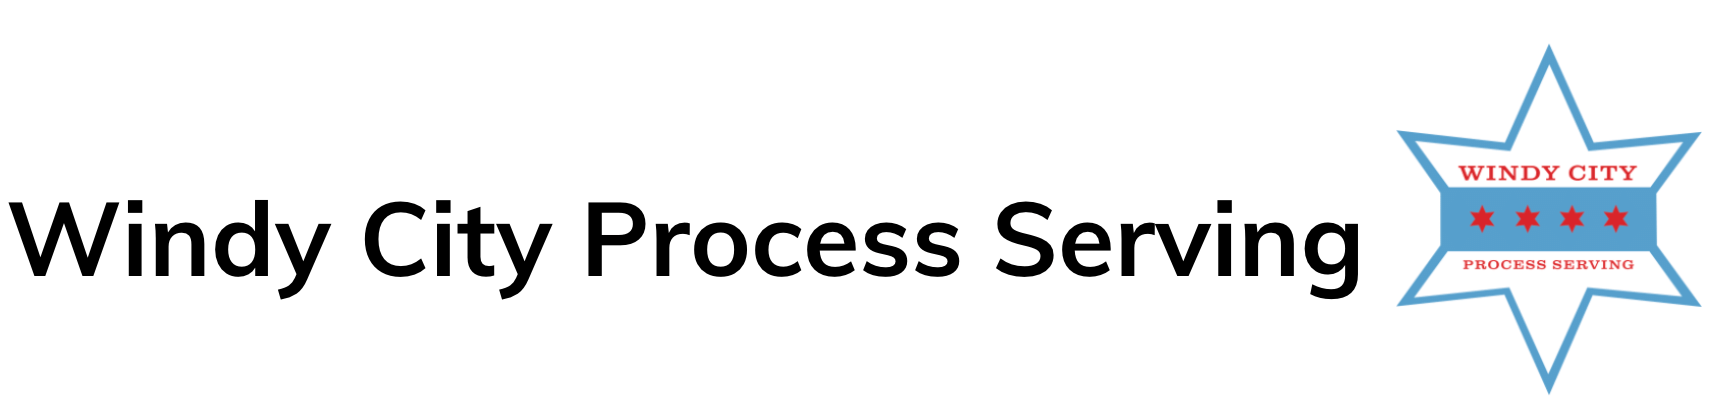 Windy City Process Serving Logo